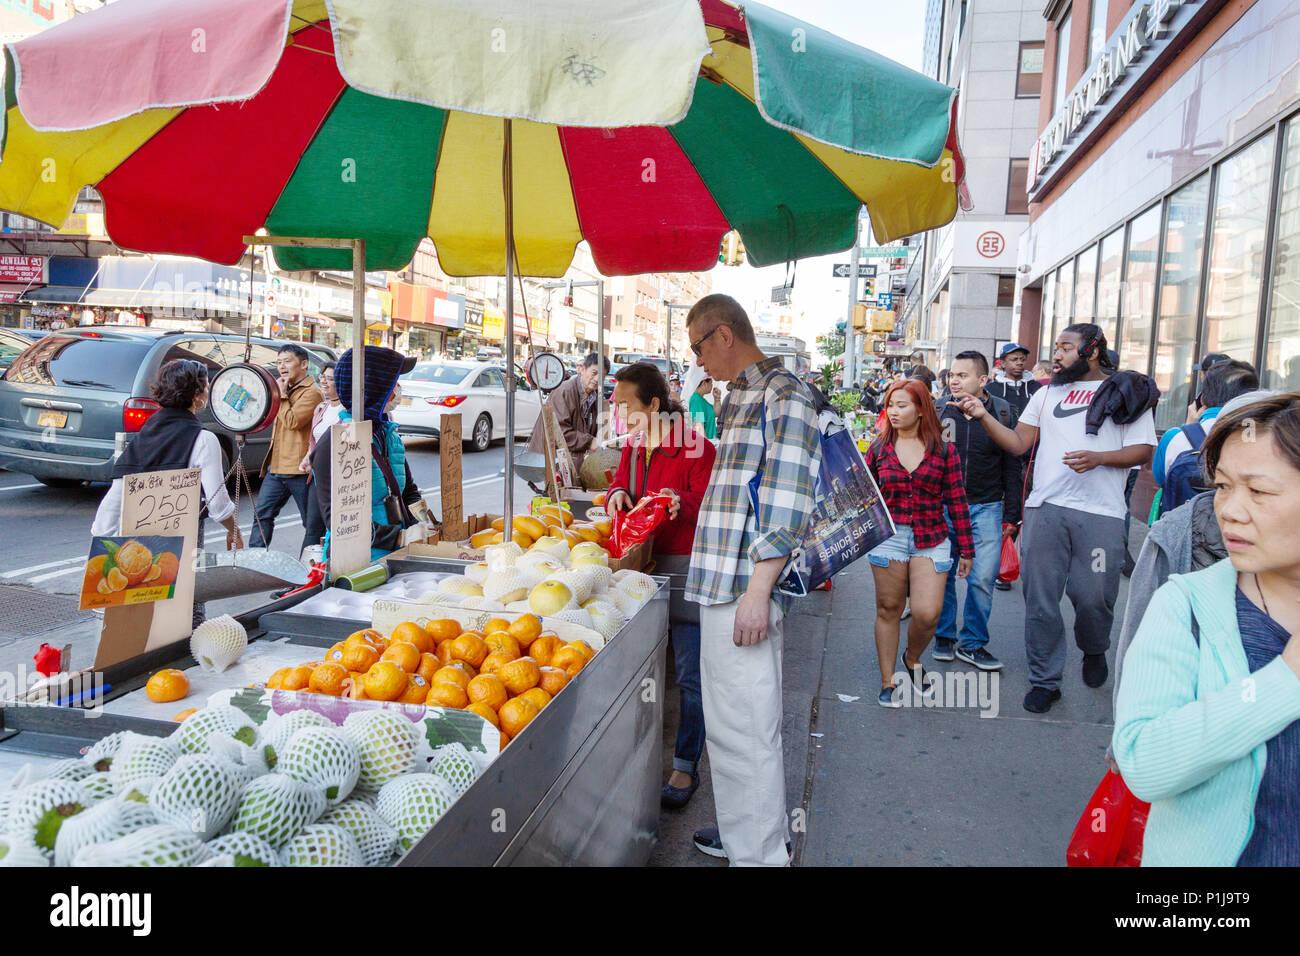 Chinatown New York City People Shopping At Roadside Stalls Chinatown Street Market Chinatown New York Usa Stock Photo Alamy